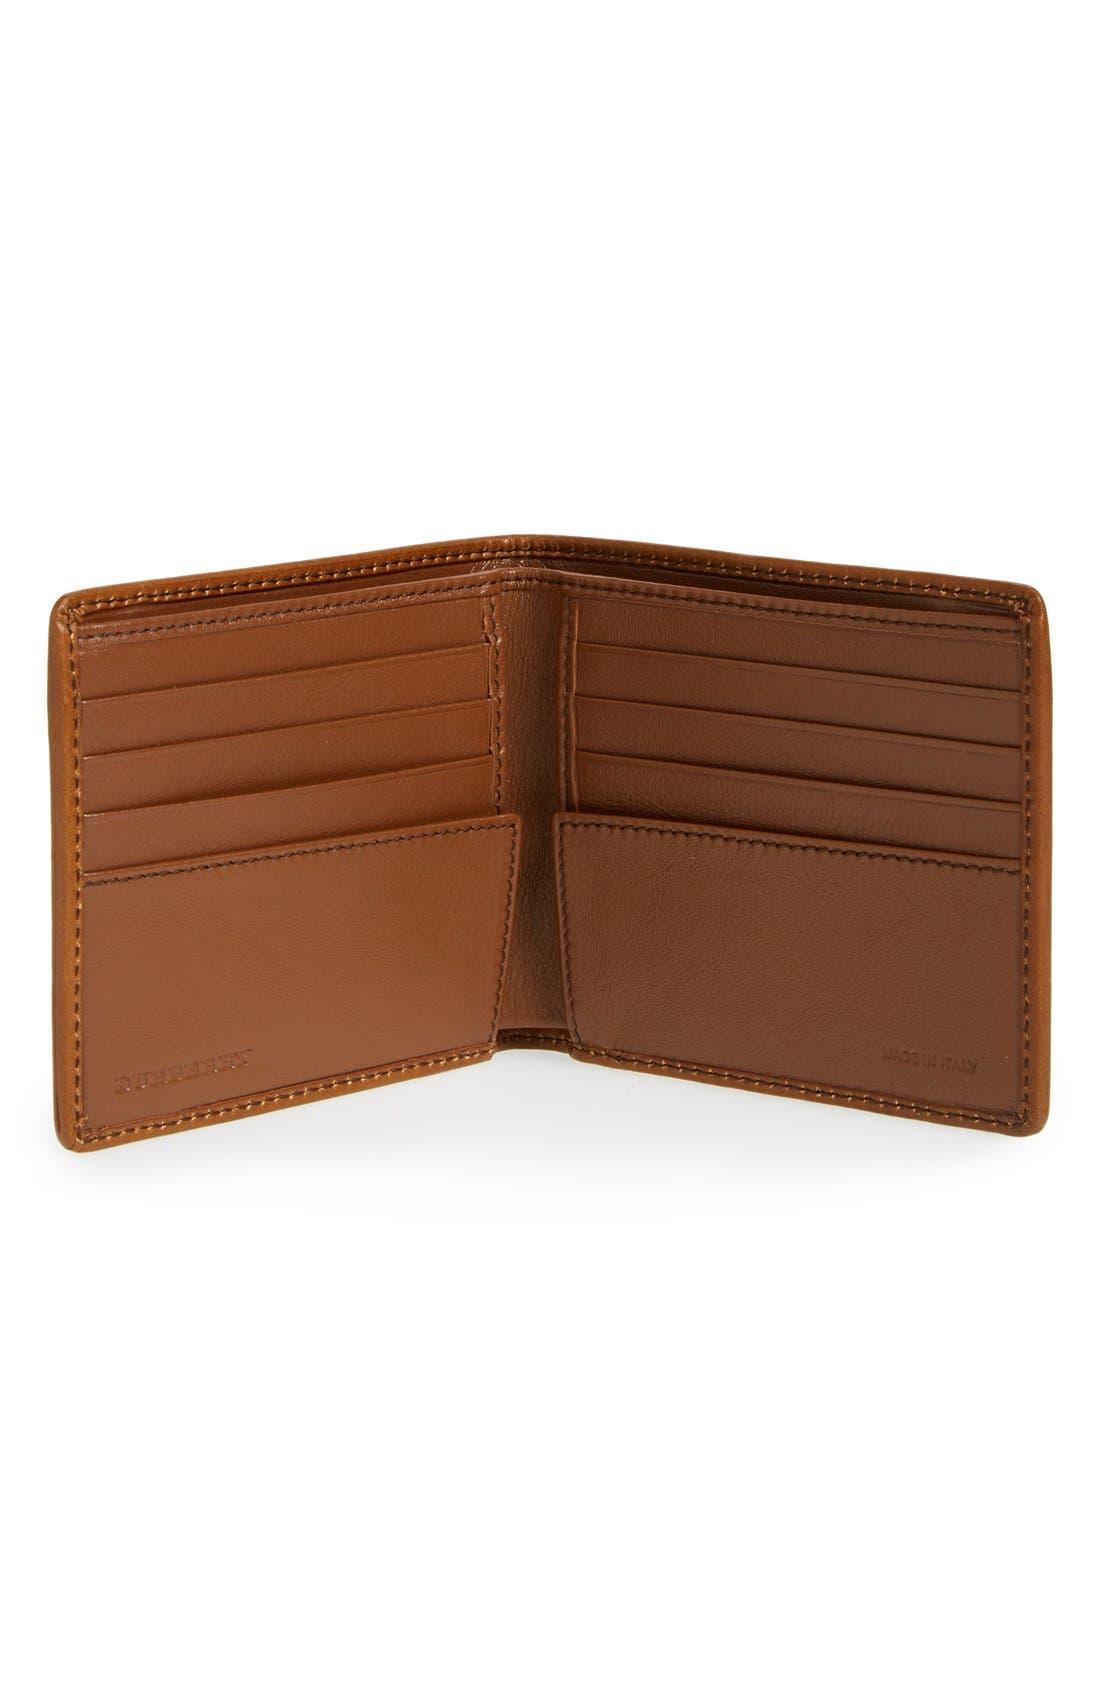 Alternate Image 2  - Burberry Horseferry Check Billfold Wallet